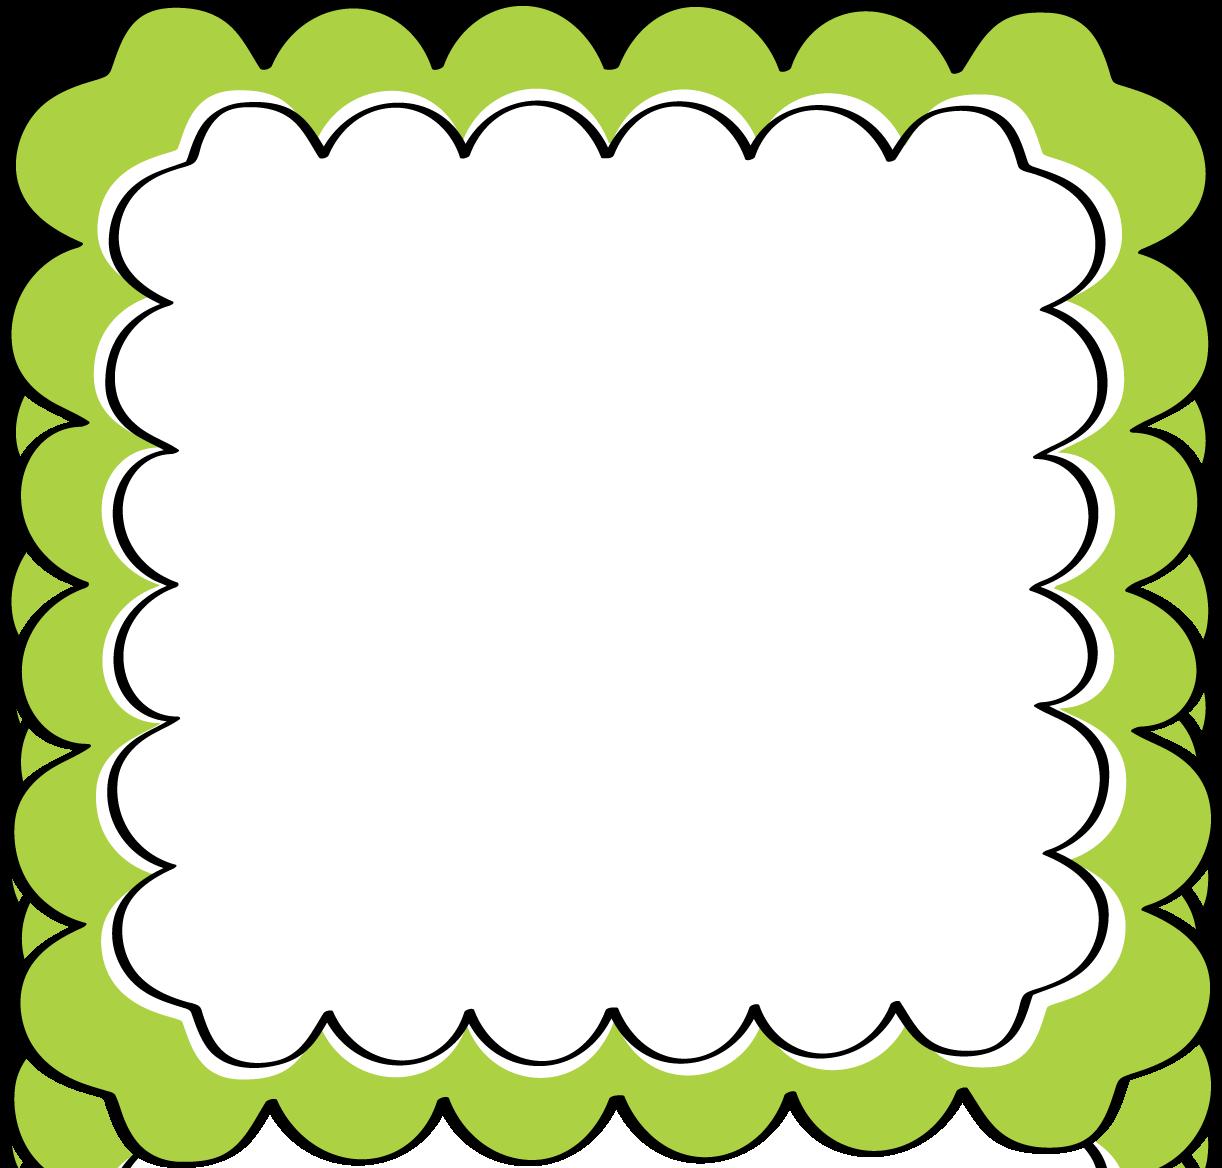 Scalloped . Frame clipart green